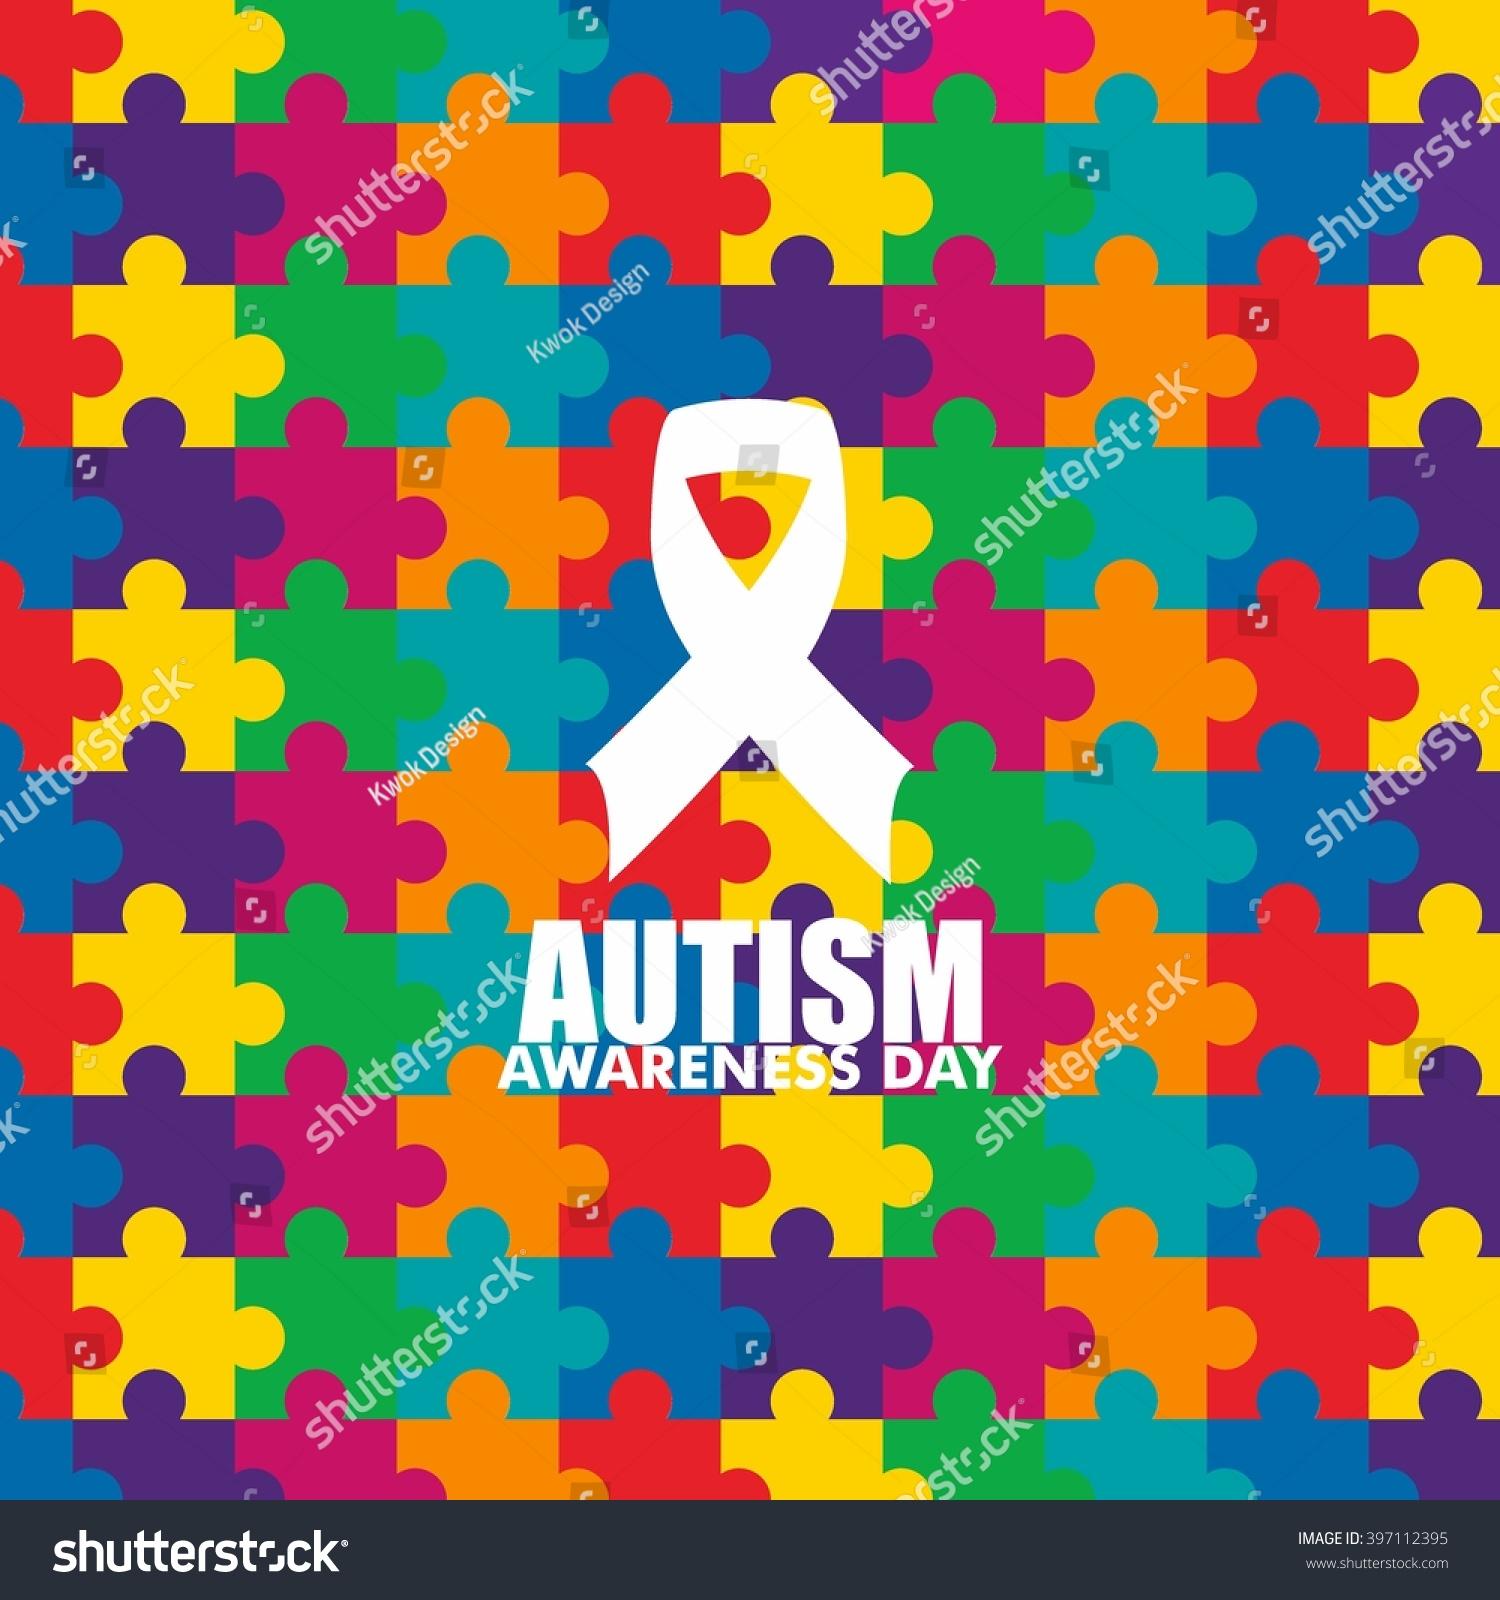 World autism awareness day logo design stock vector 397112395 world autism awareness day logo design template vector illustration colorful puzzles symbol biocorpaavc